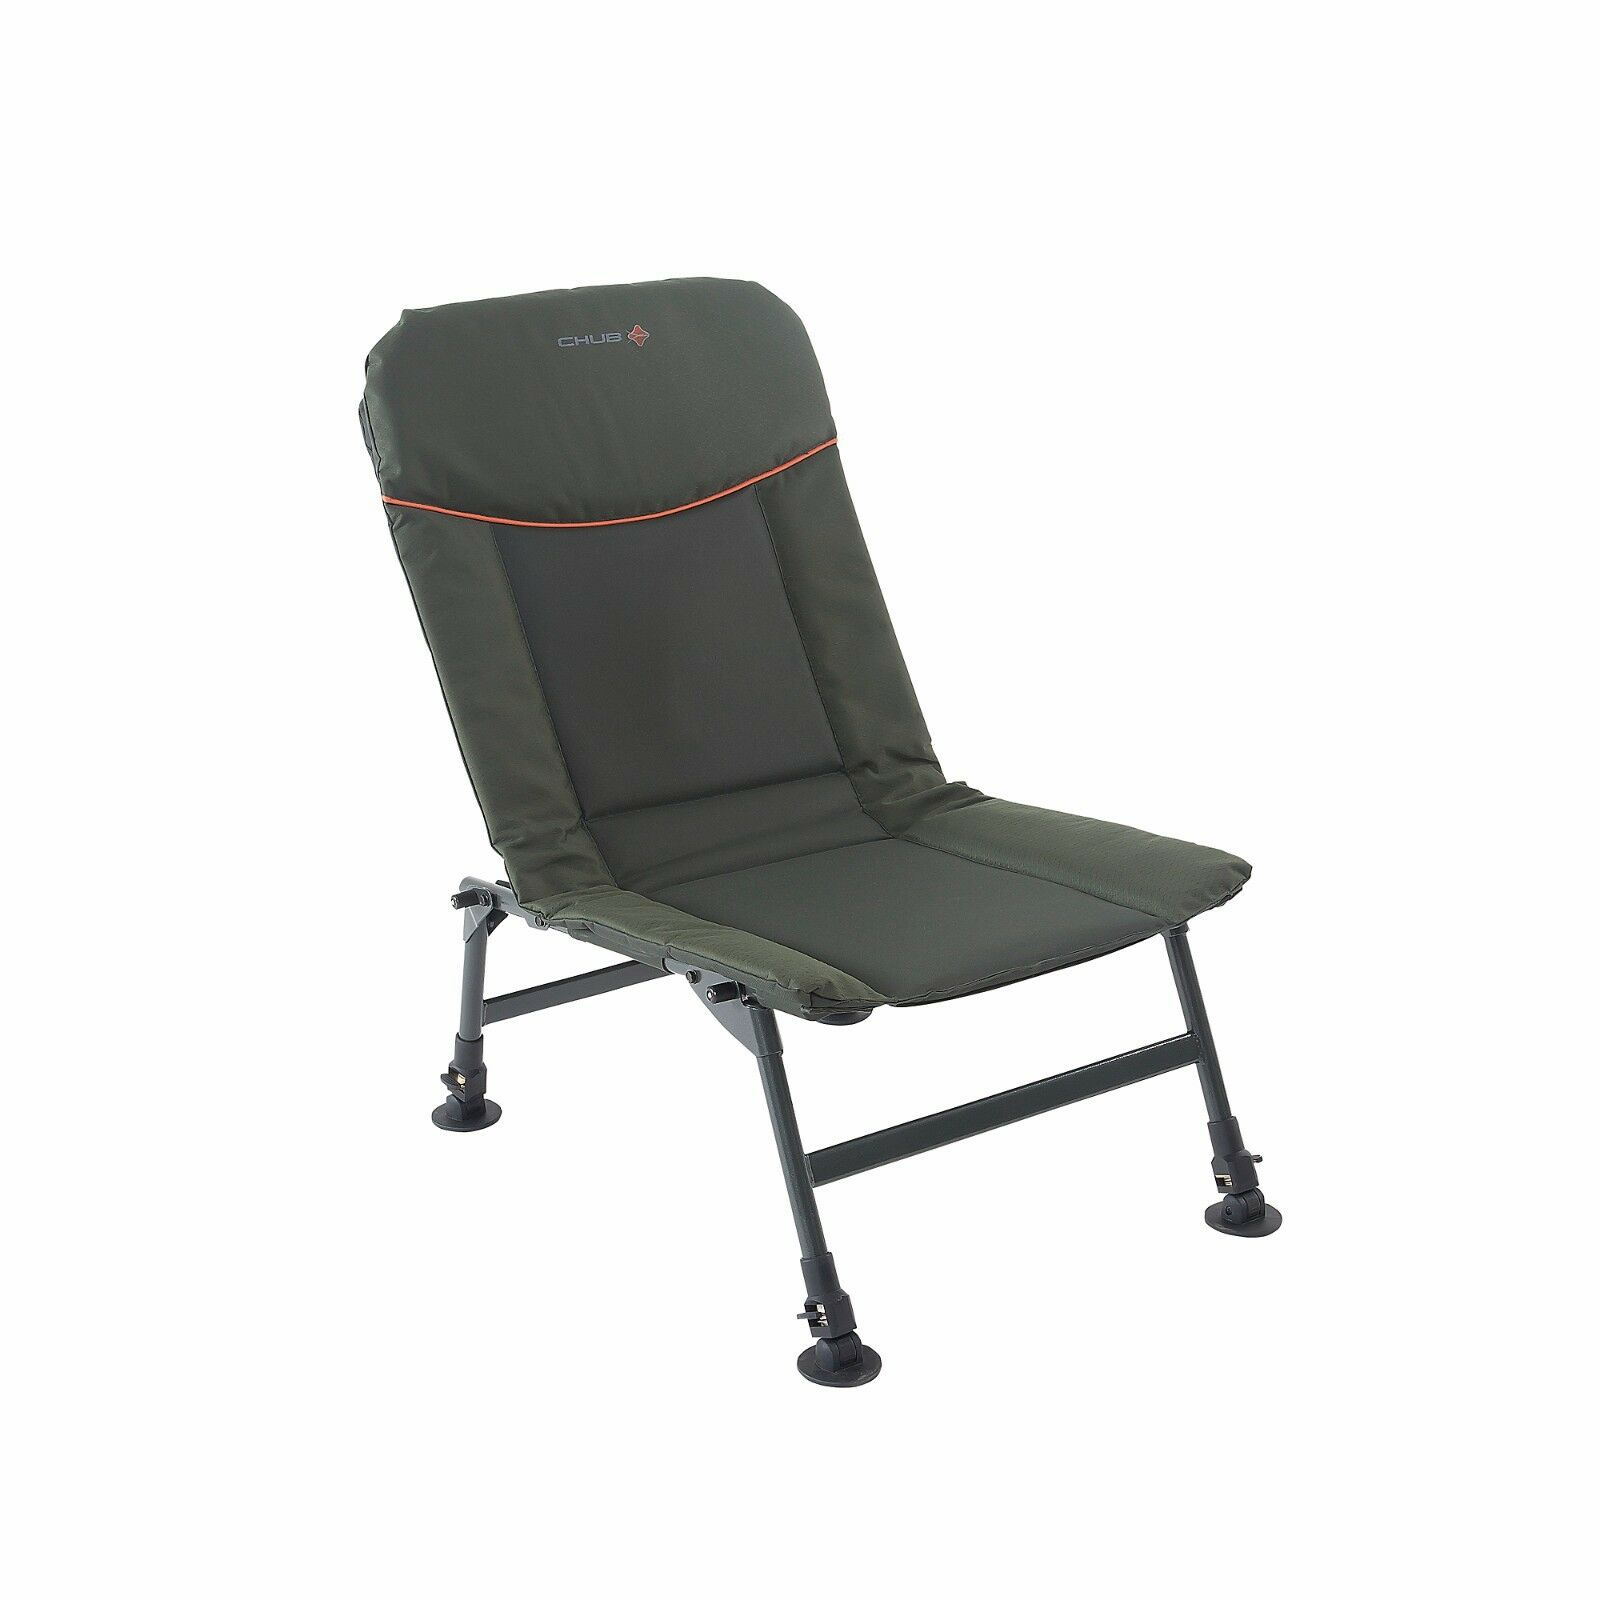 Chub RS-Plus Chair - Fully Adjustable, Robust, Folding Fishing Seat